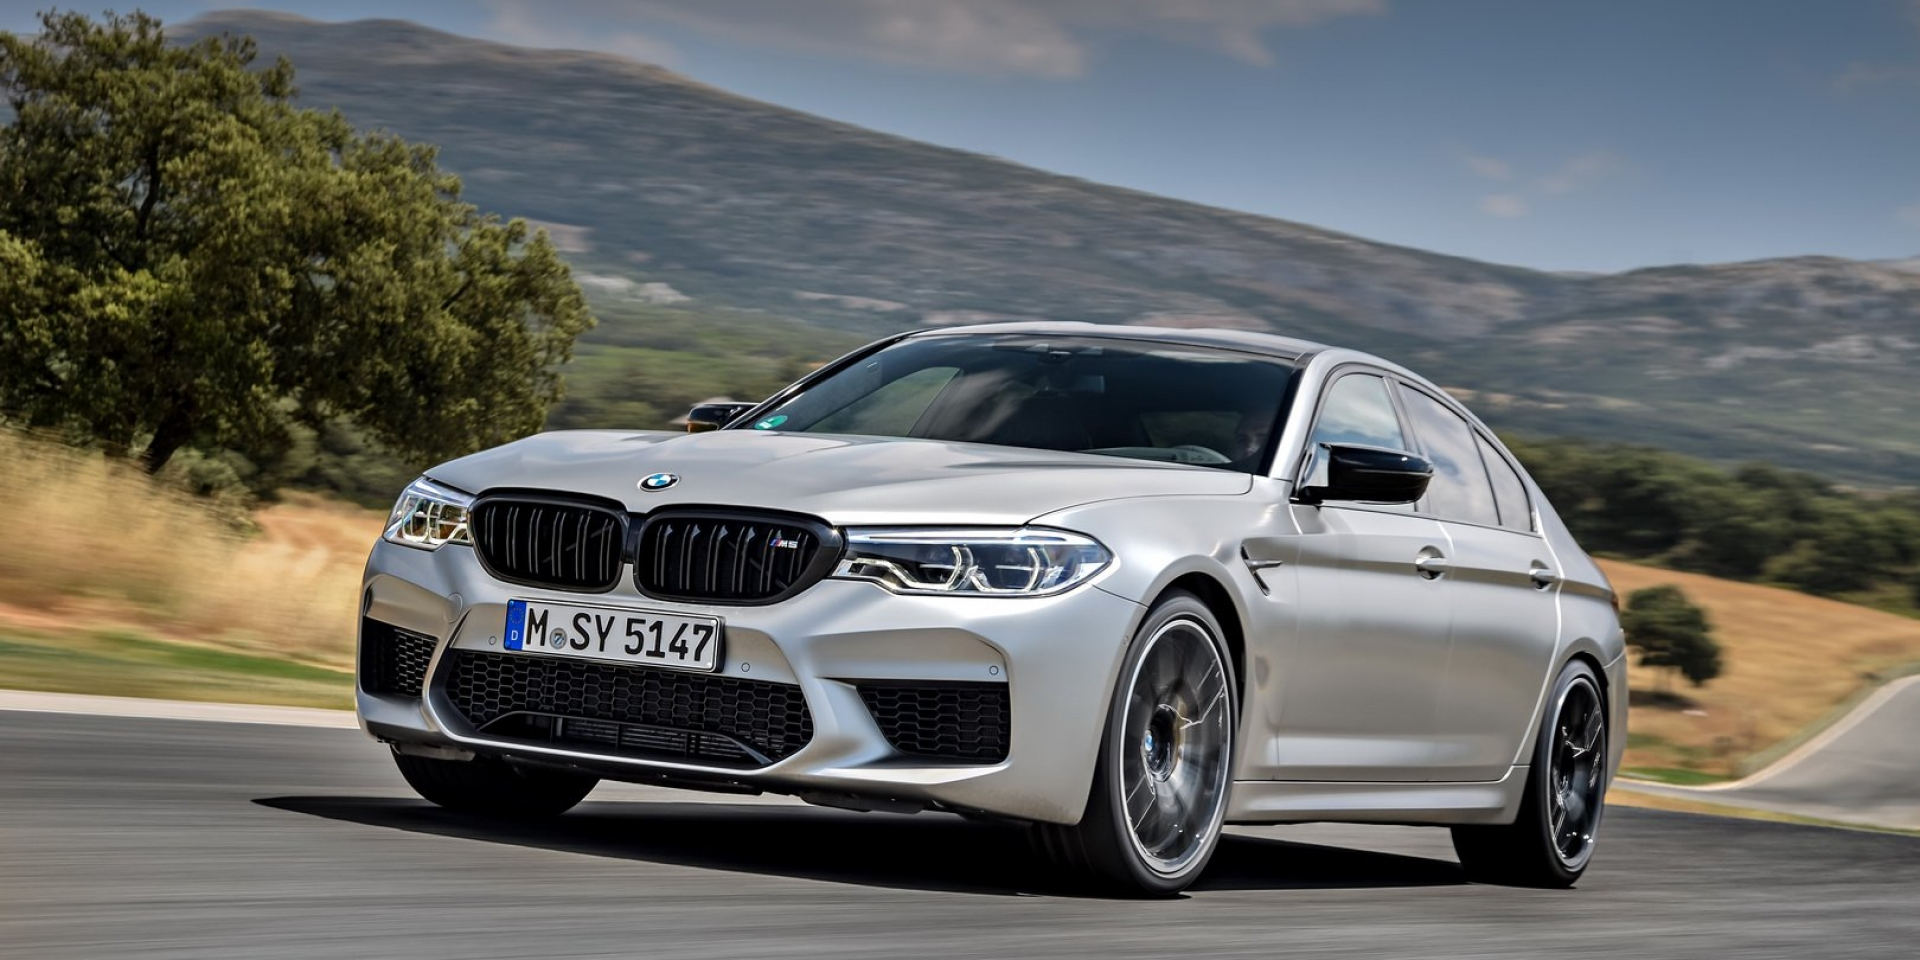 BMW還在開發引擎!M5 CS將有新的V8動力!